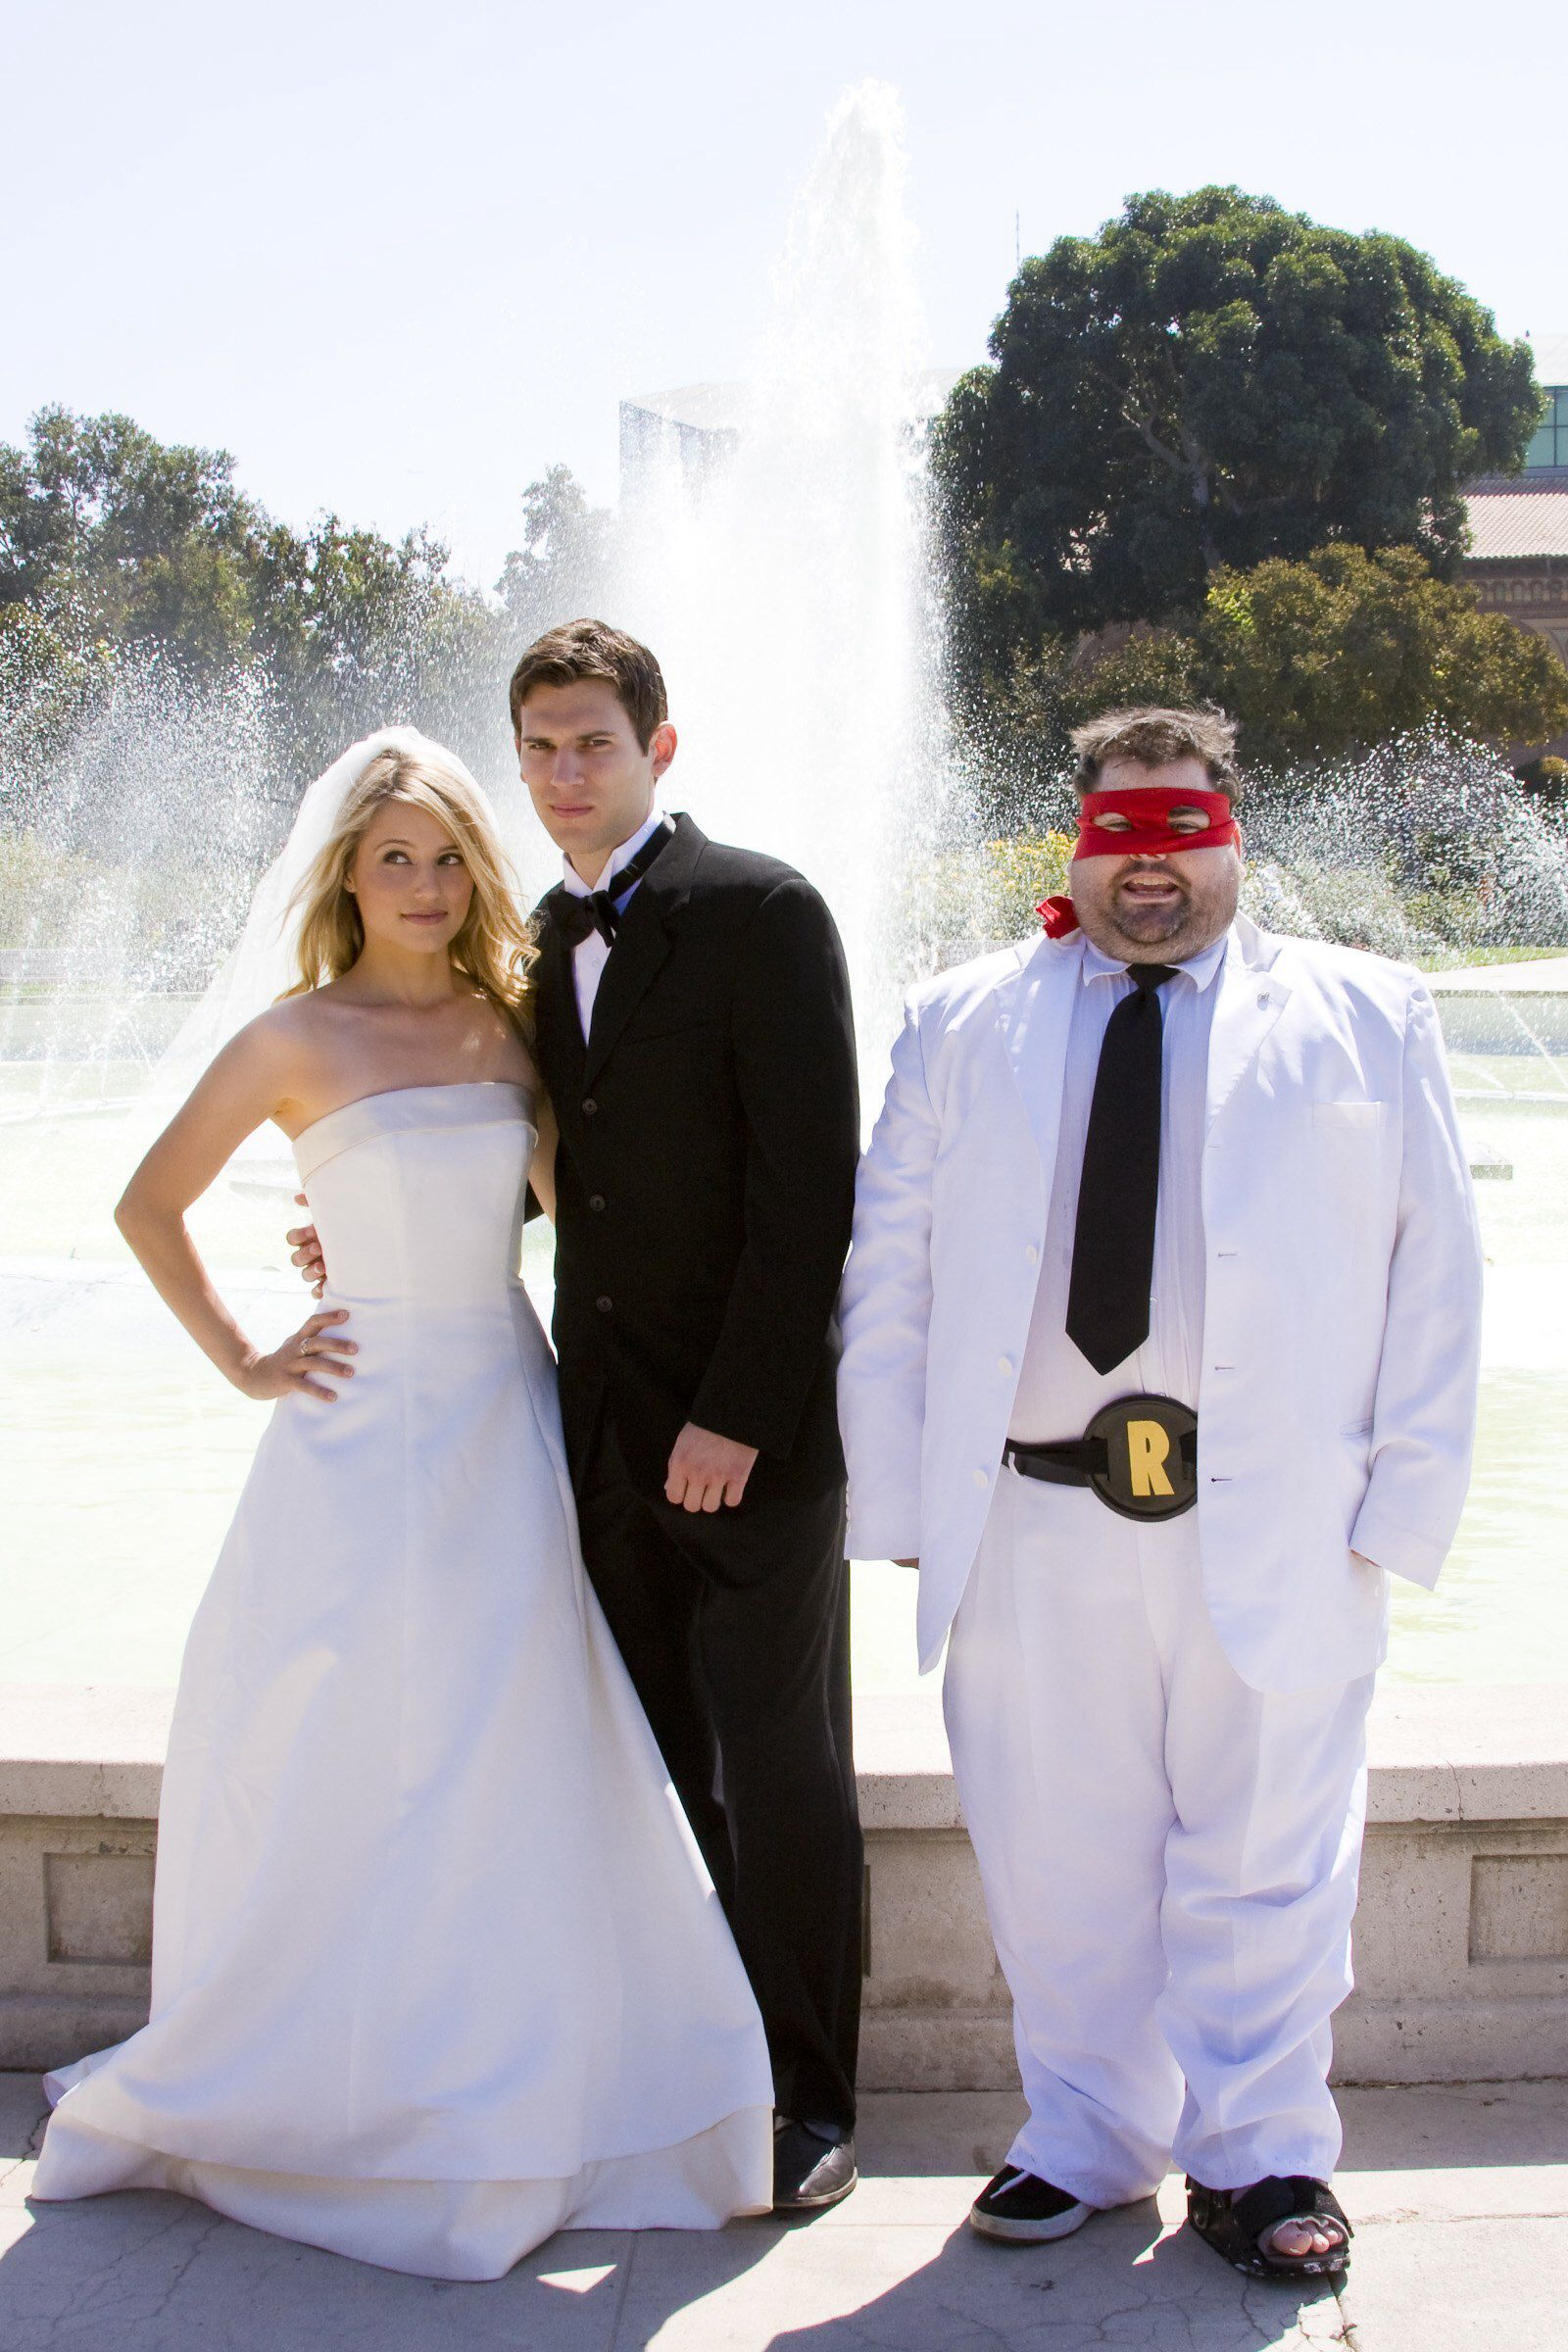 Dianna Agron Wedding.Dianna Agron Wedding Dinner With Raphael Dianna Agron